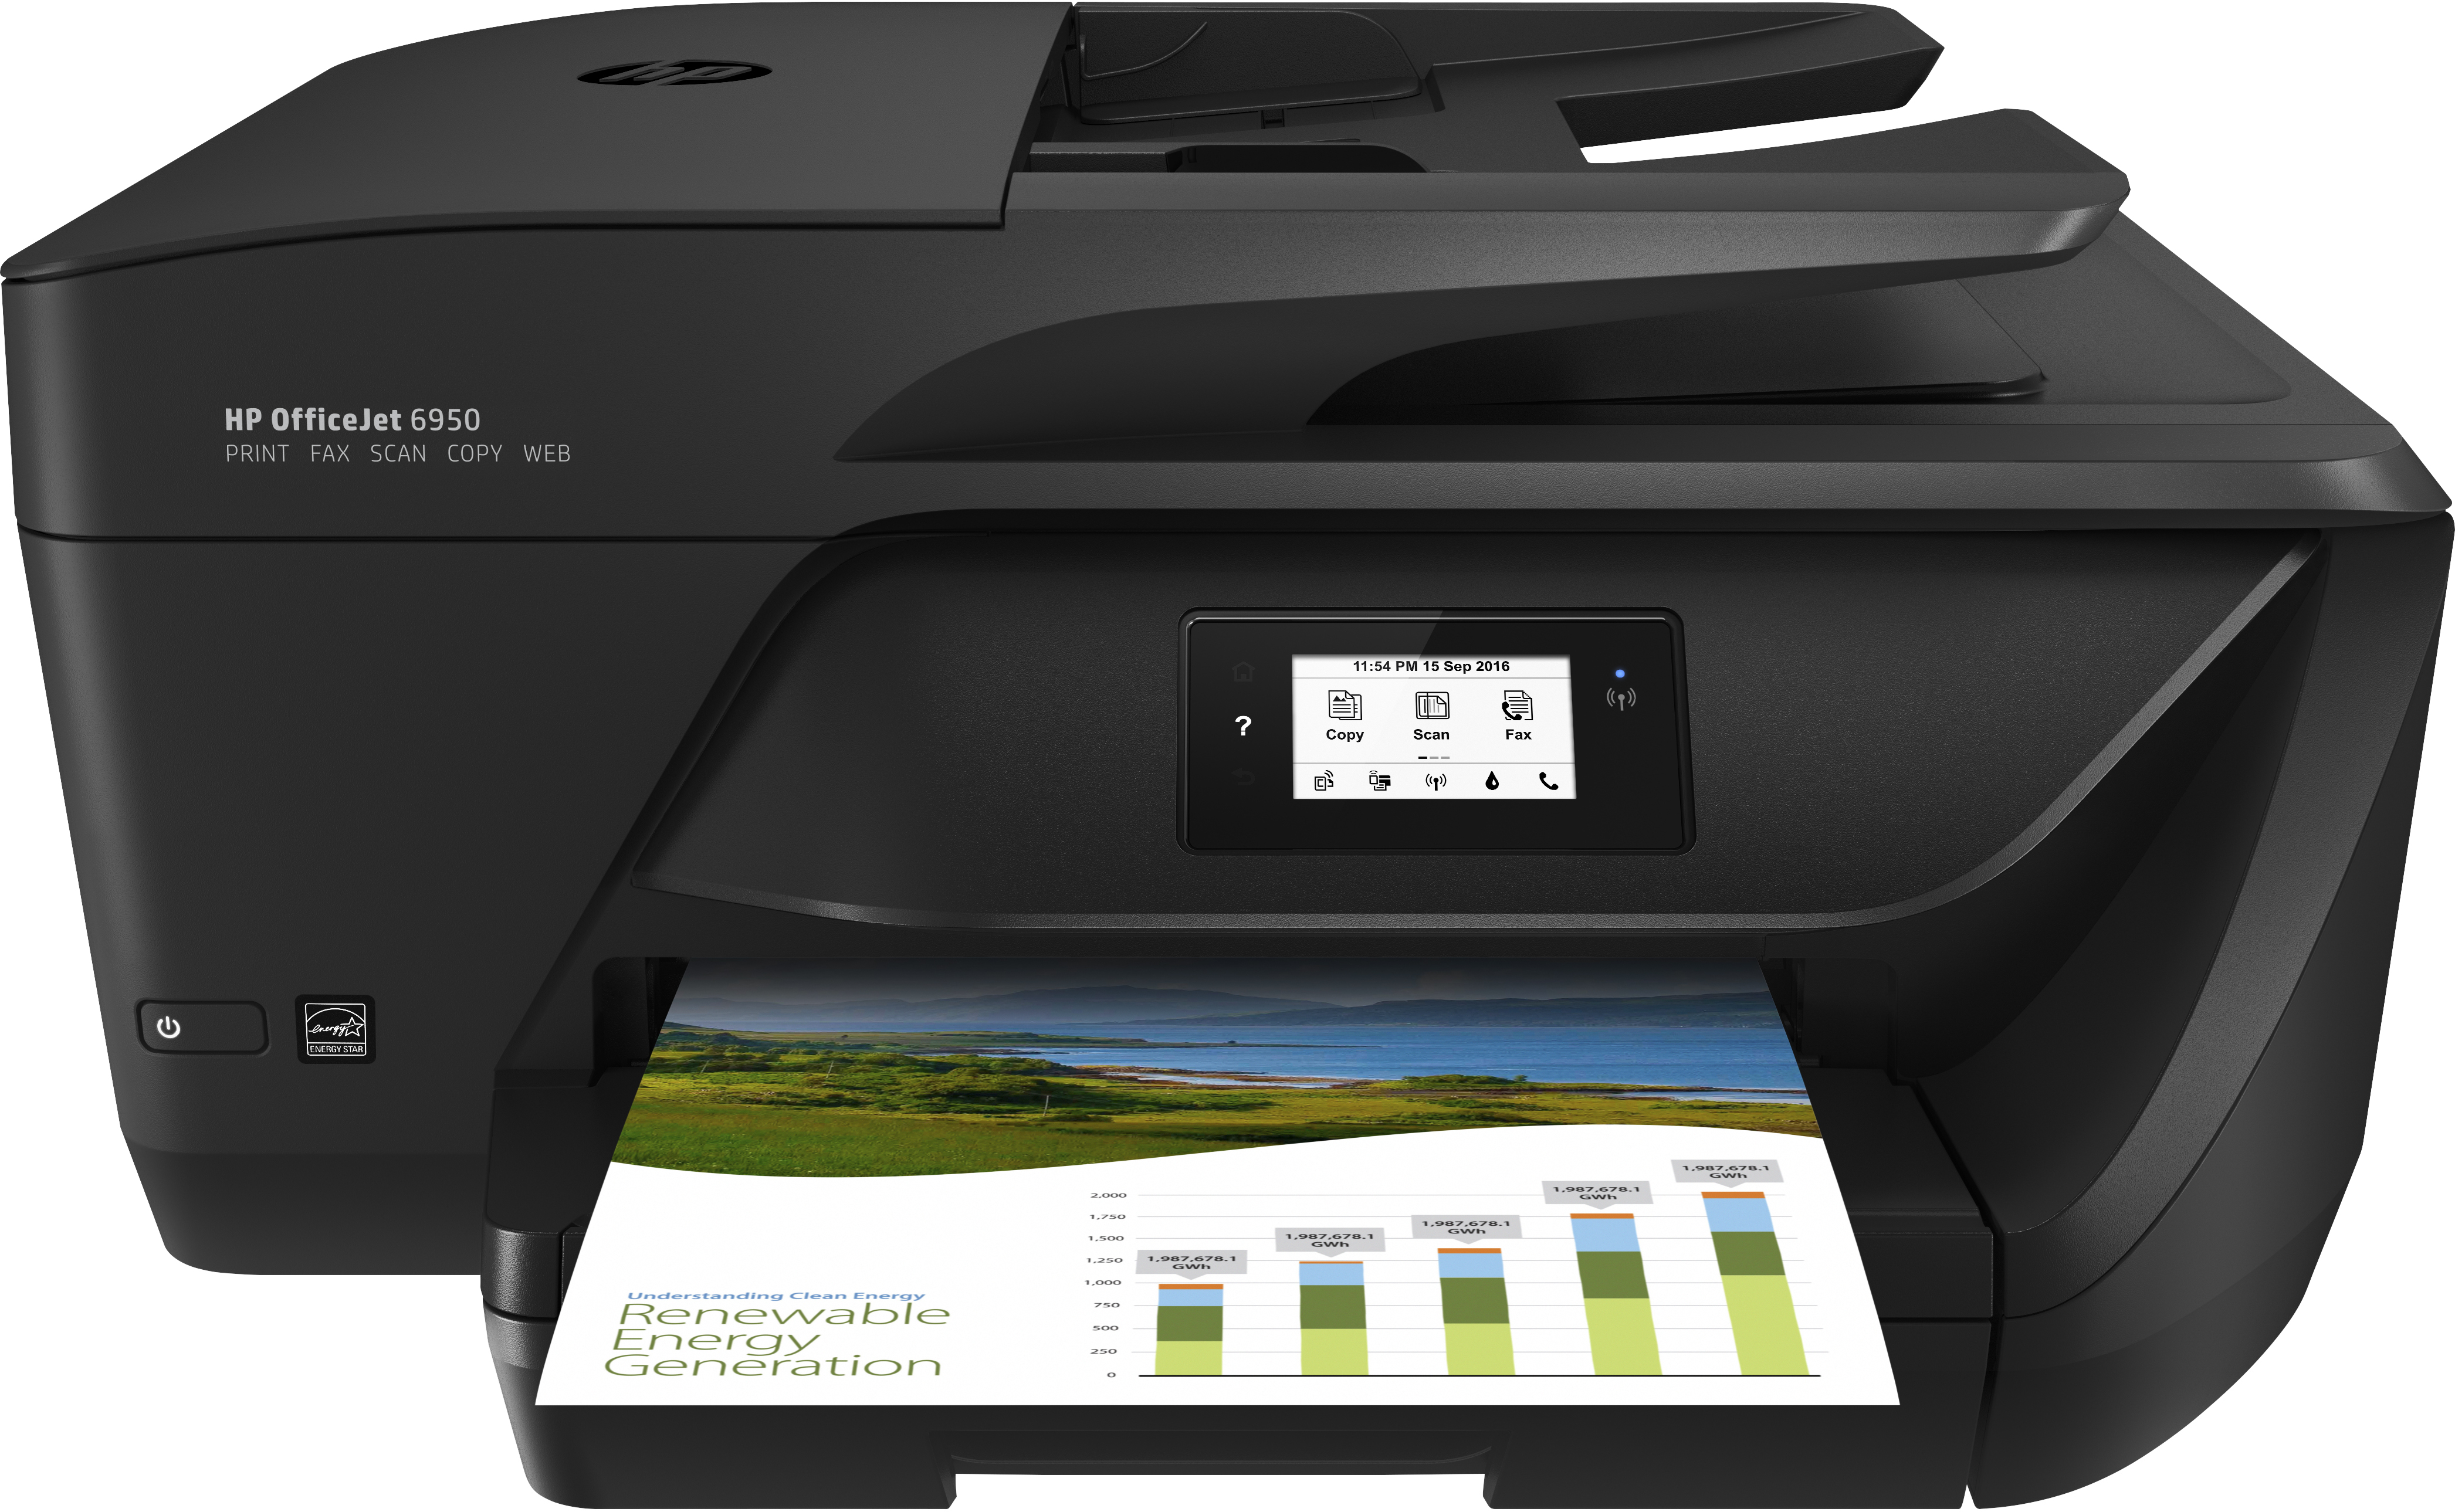 Officejet 6950 All-in-One Multifunction printer (A4, 28 ppm, duplex, USB 2.0, Wi-Fi)